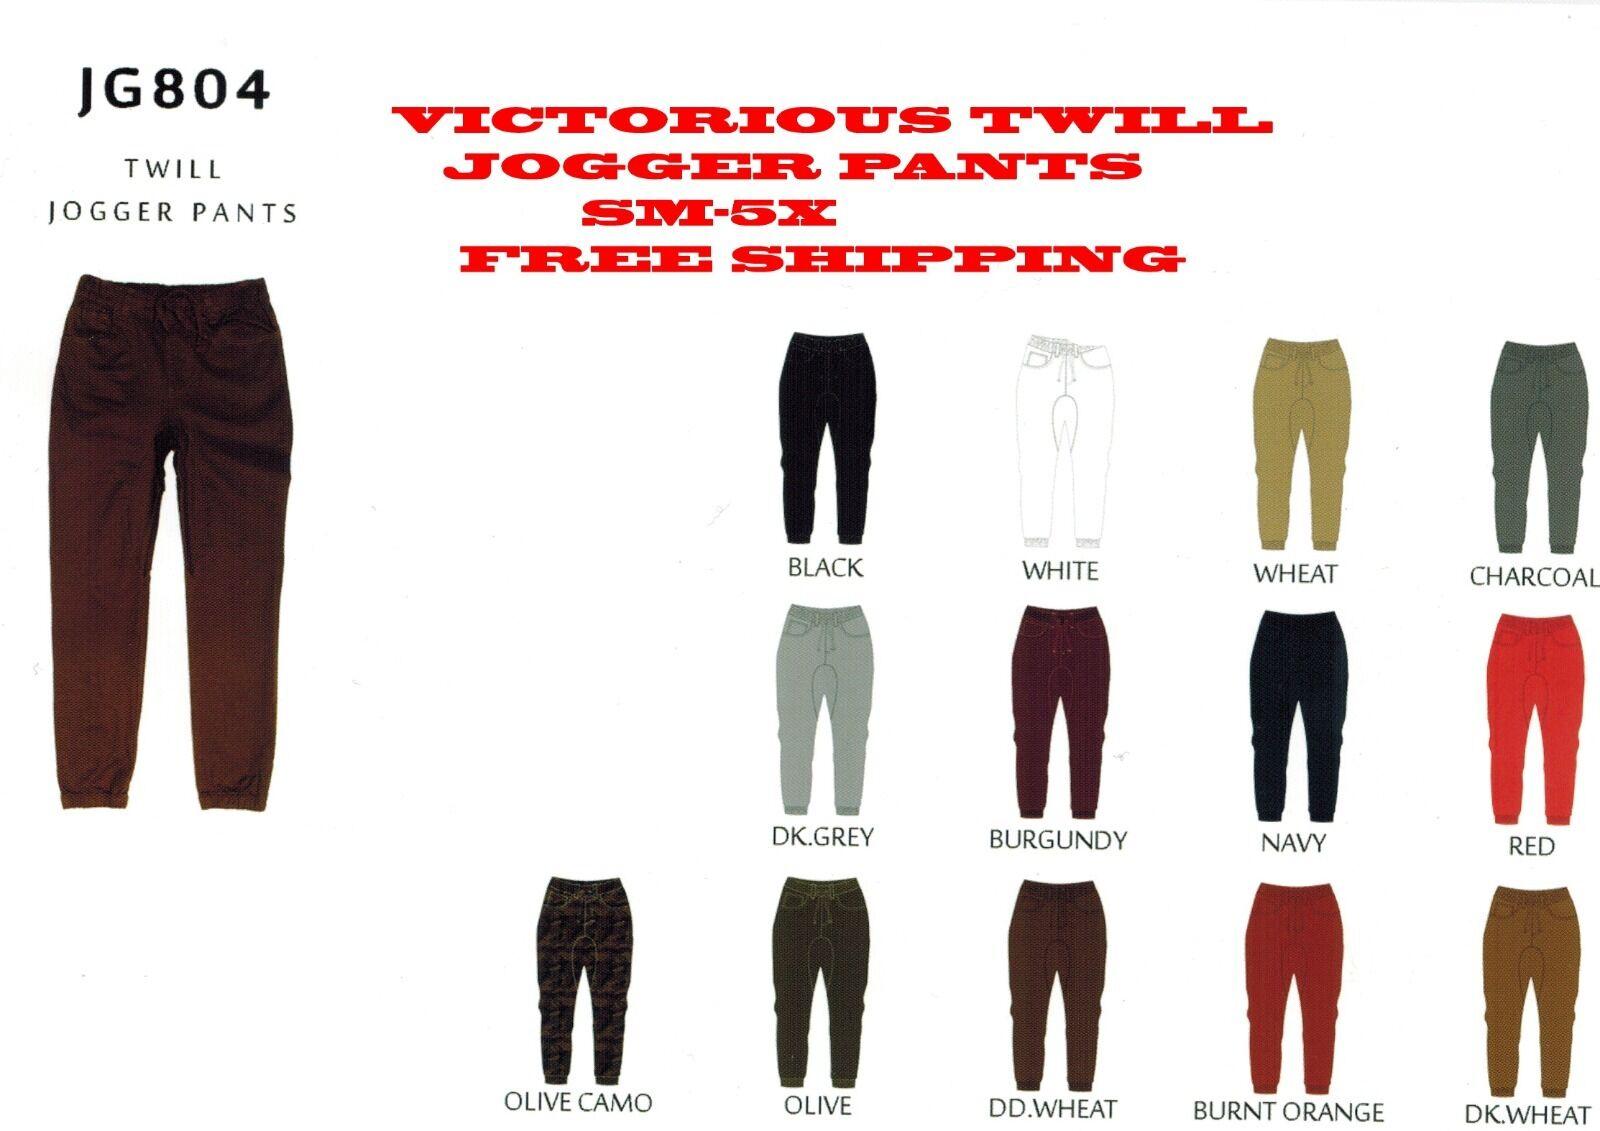 Victorious Mens Twill Jogger Pants Drop Credch JG804 Free Shipping